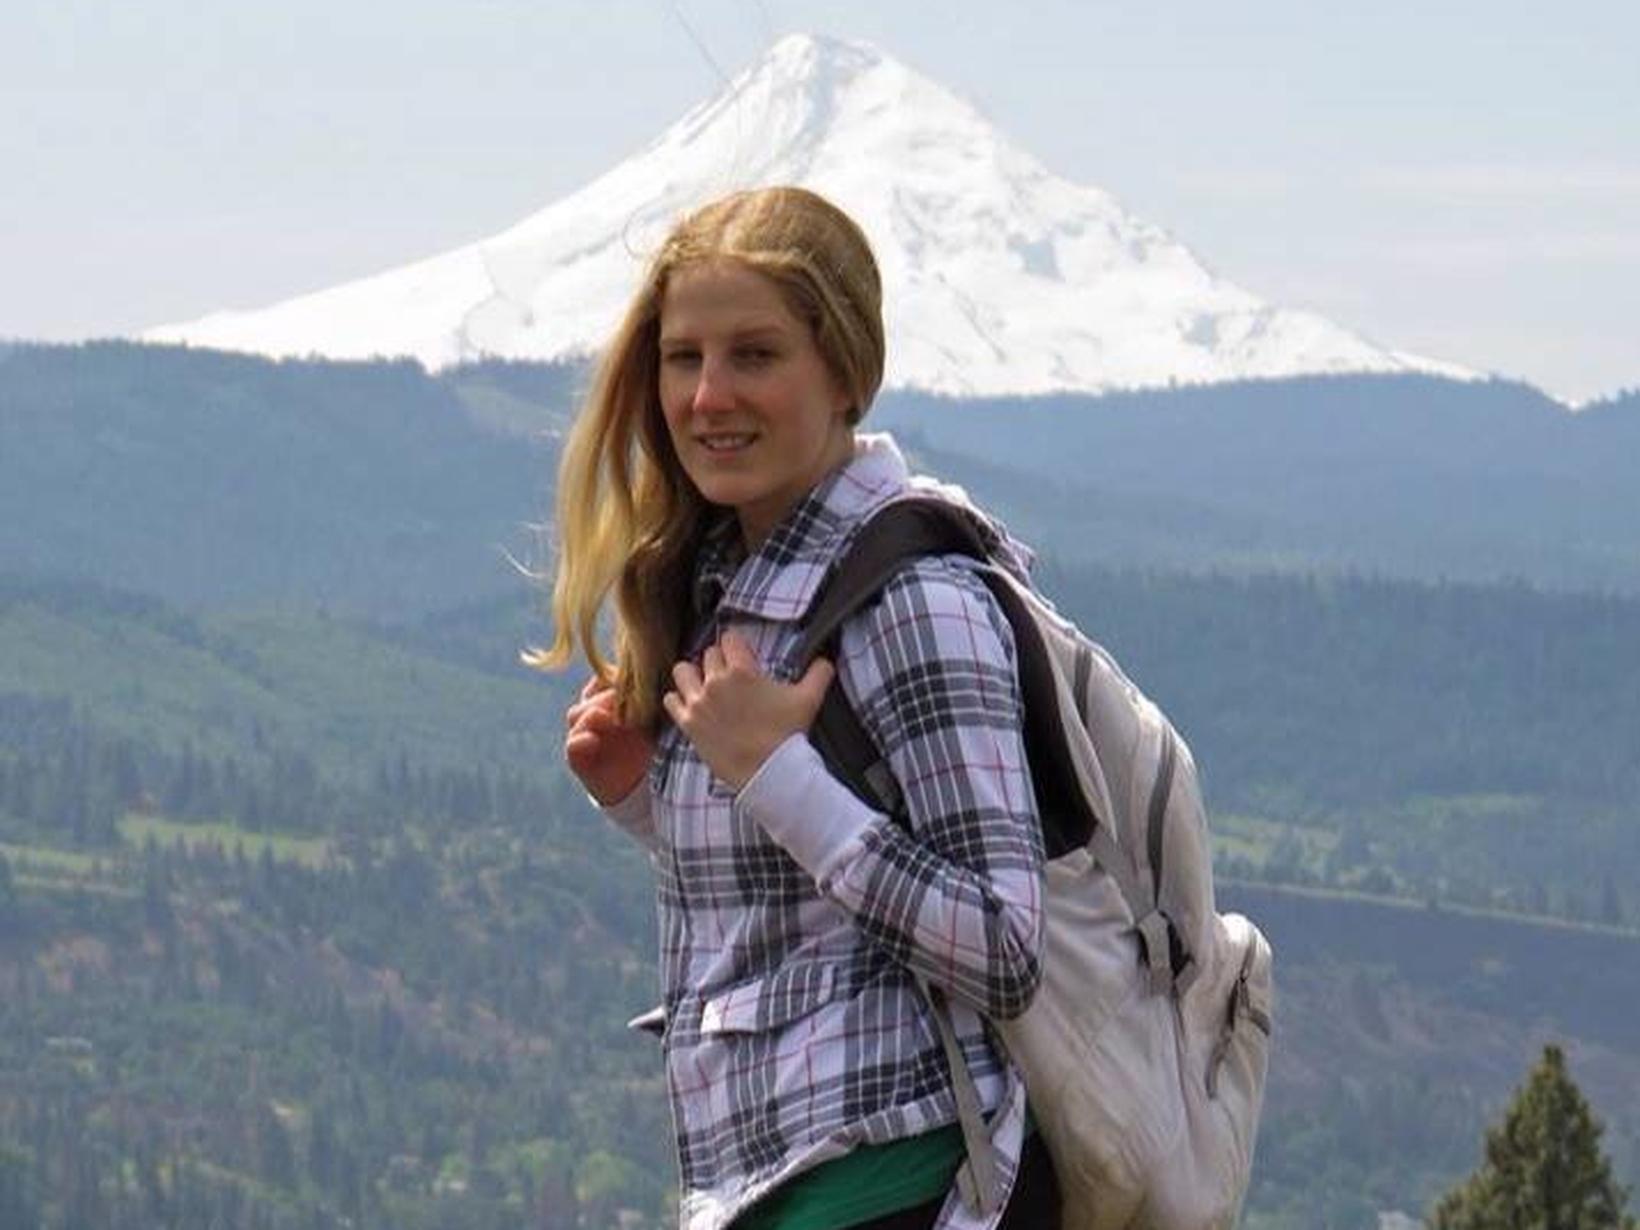 Ilona from Portland, Oregon, United States